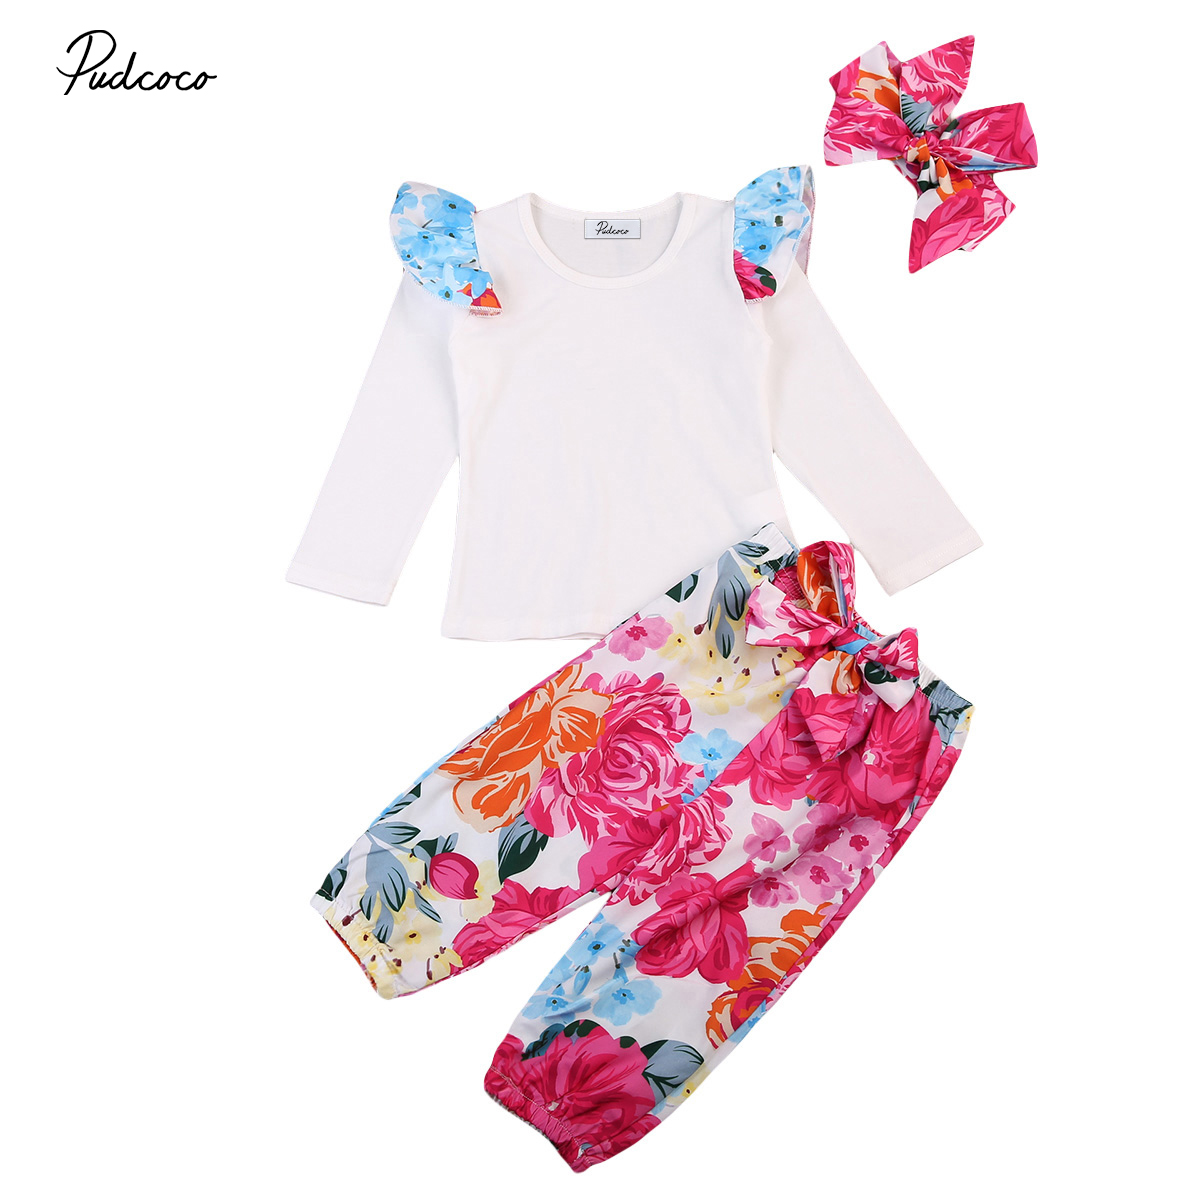 Cute 3pcs Toddler Newborn Kids Baby Girl Autumn Clothes Set T-shirt+Pants+Headband Outfits